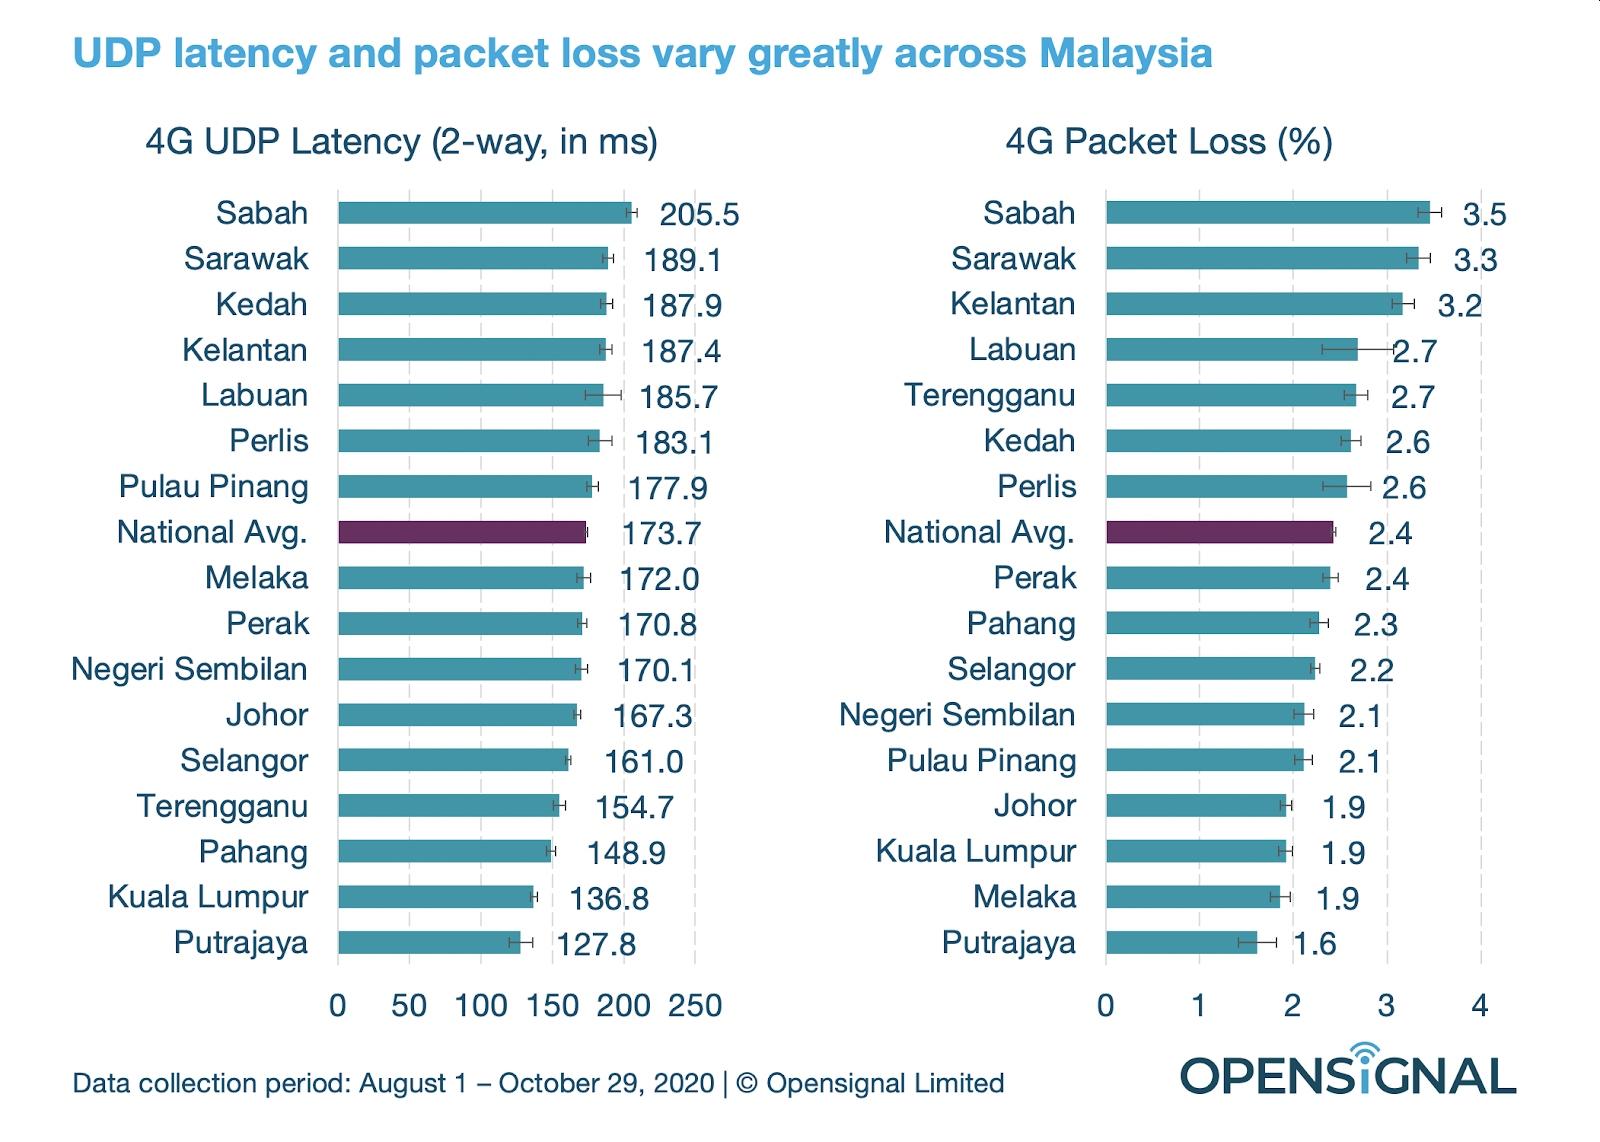 Malaysia 4G UDP latency and packetloss